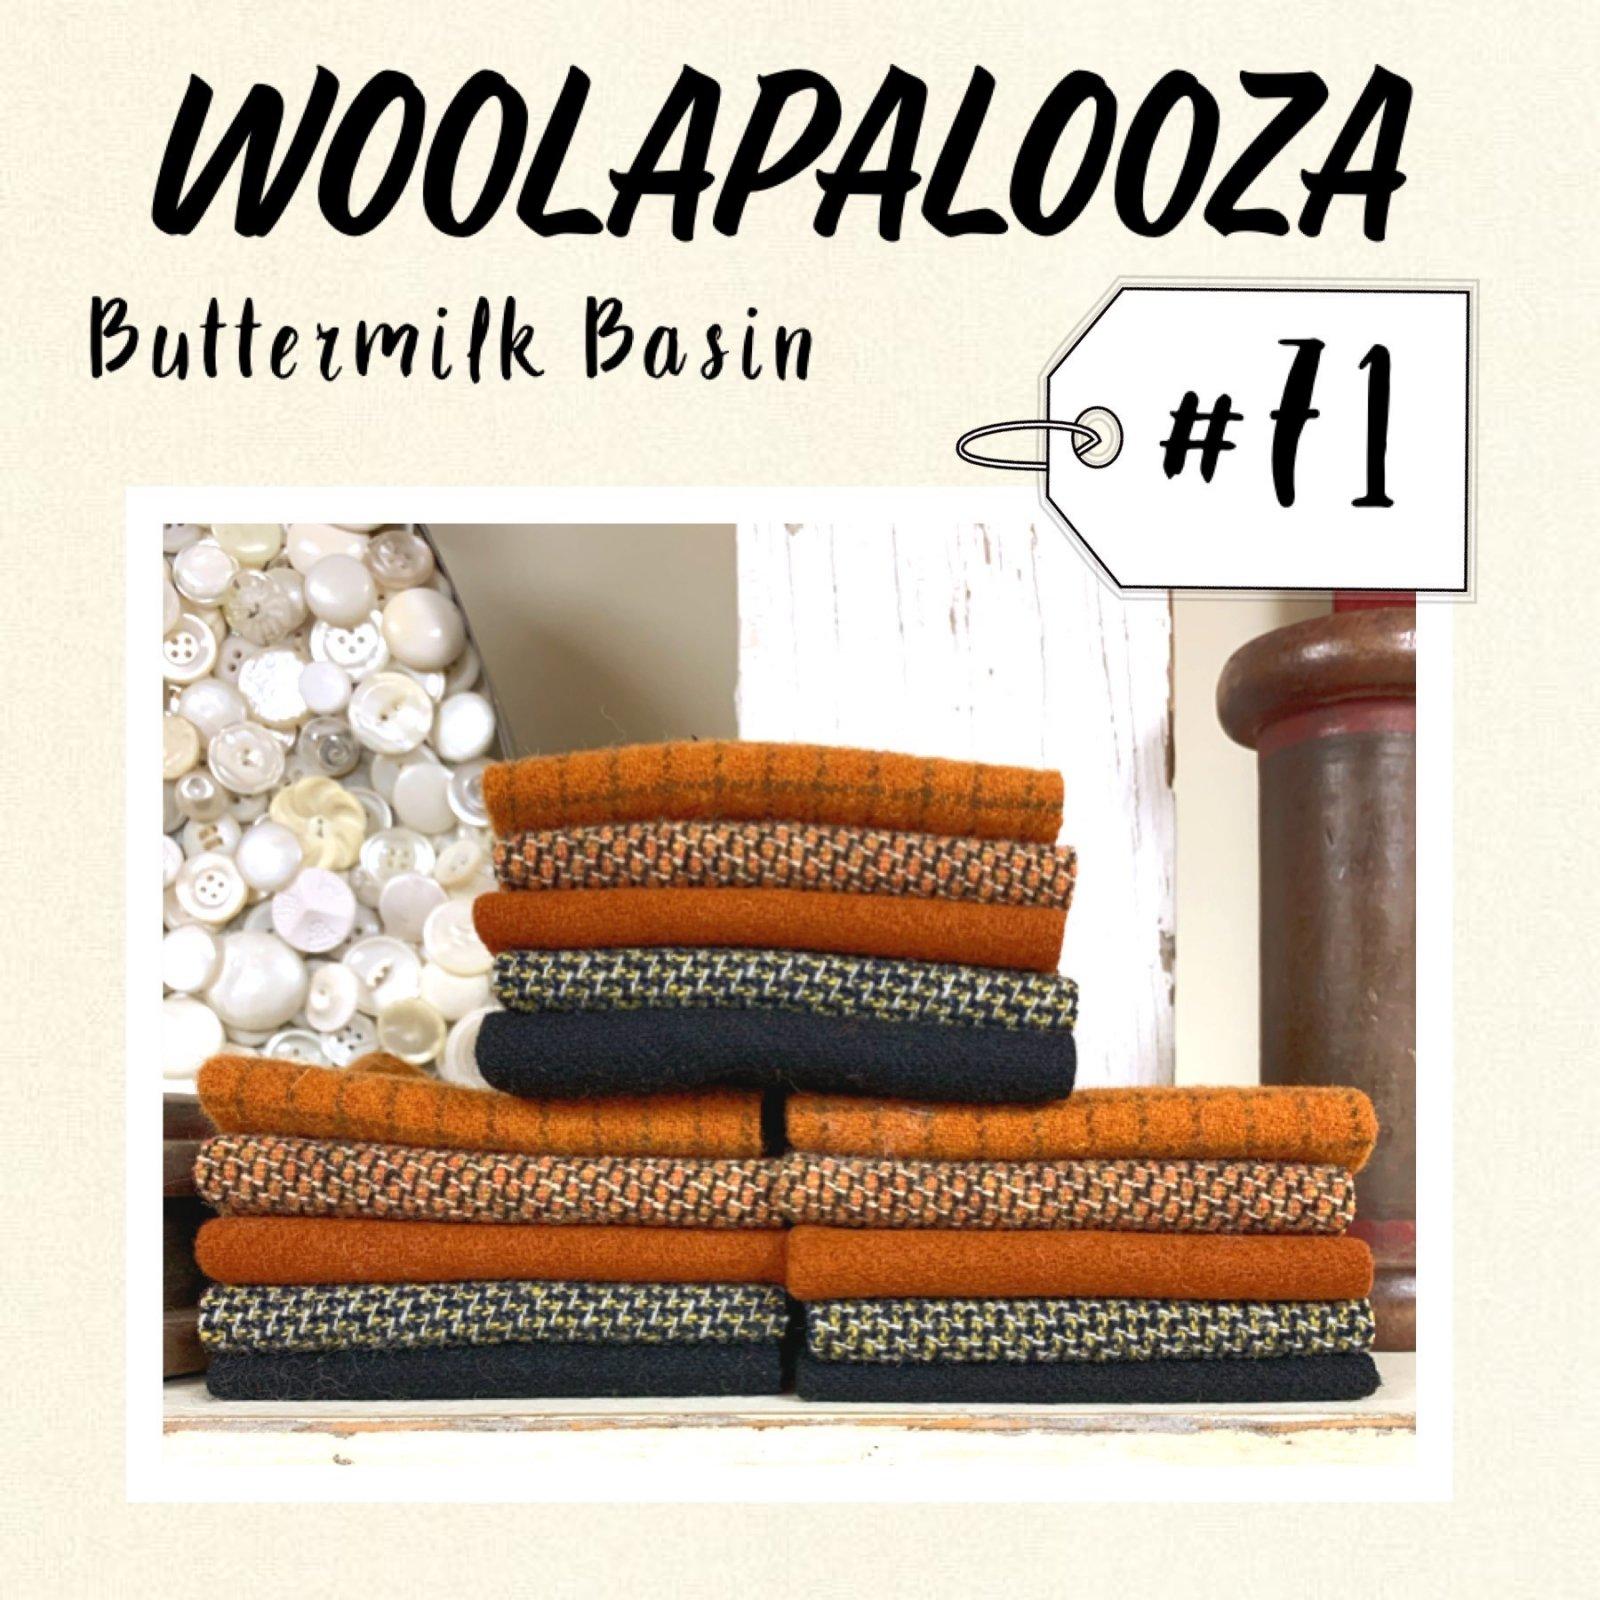 Woolapalooza #71 Wool Bundle